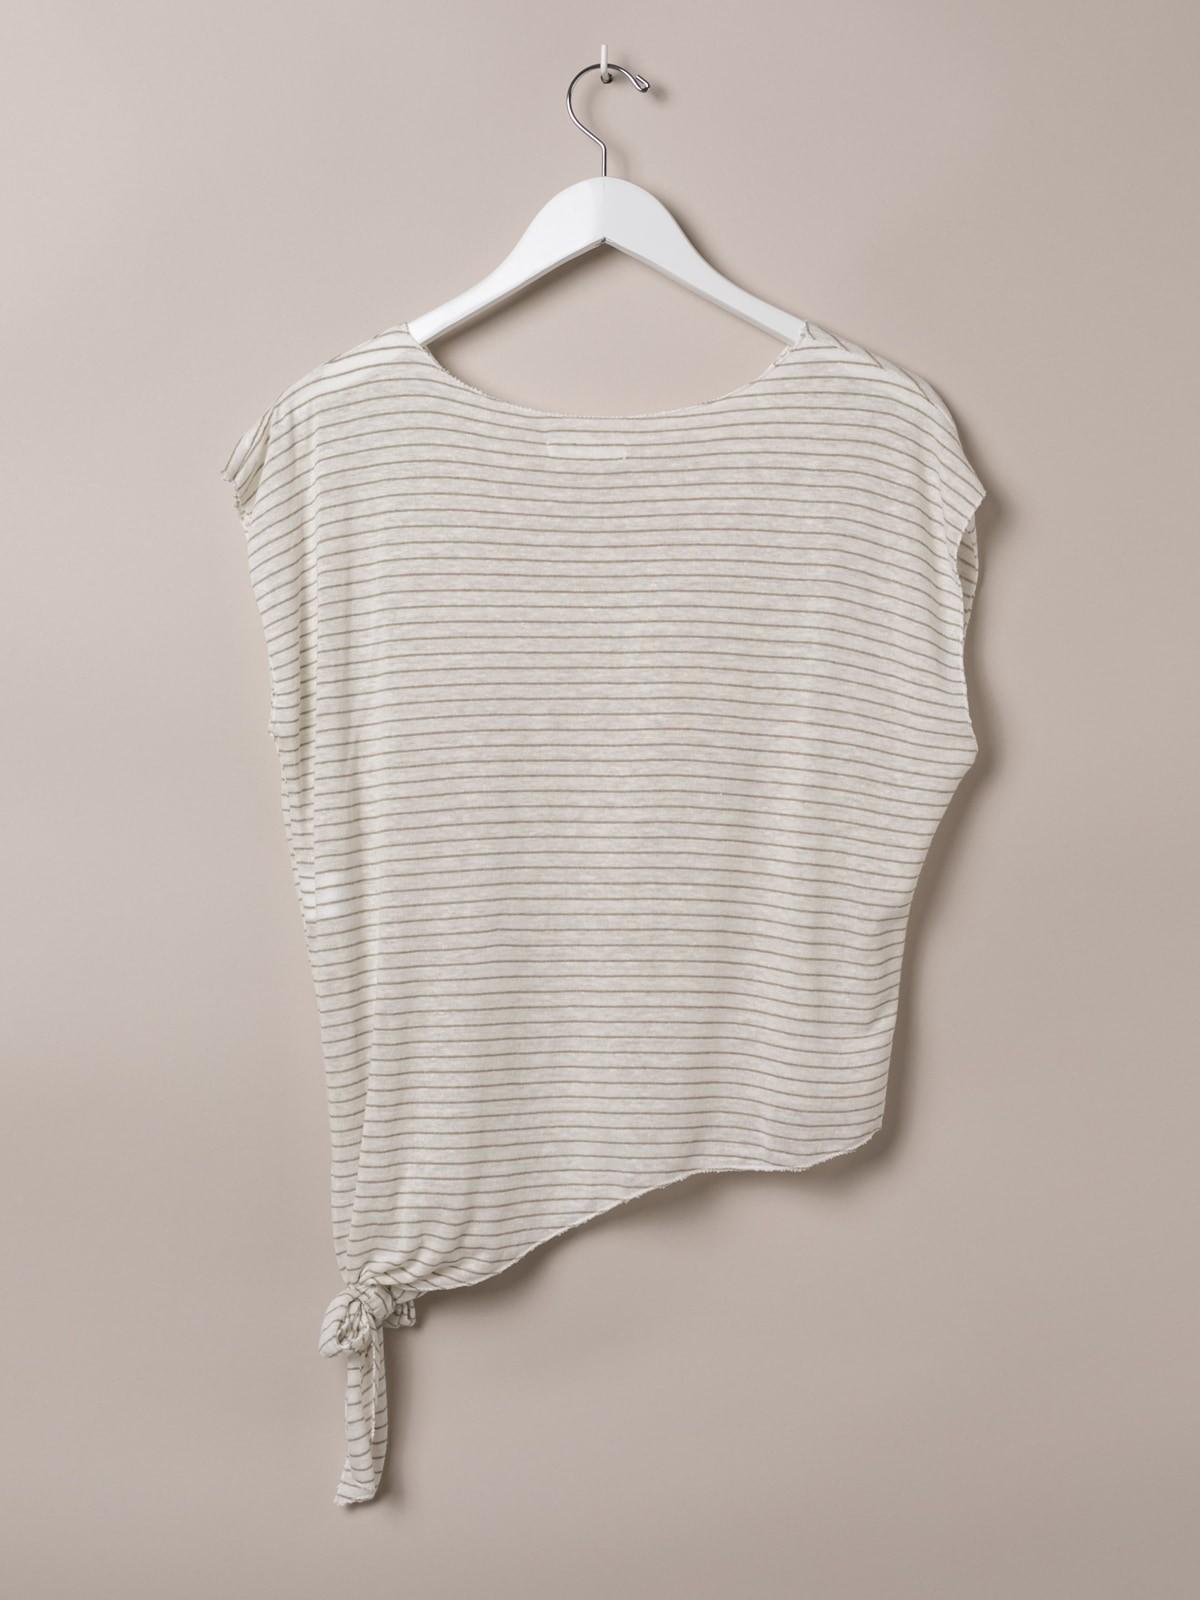 Camiseta mujer de rayas anudada Beige